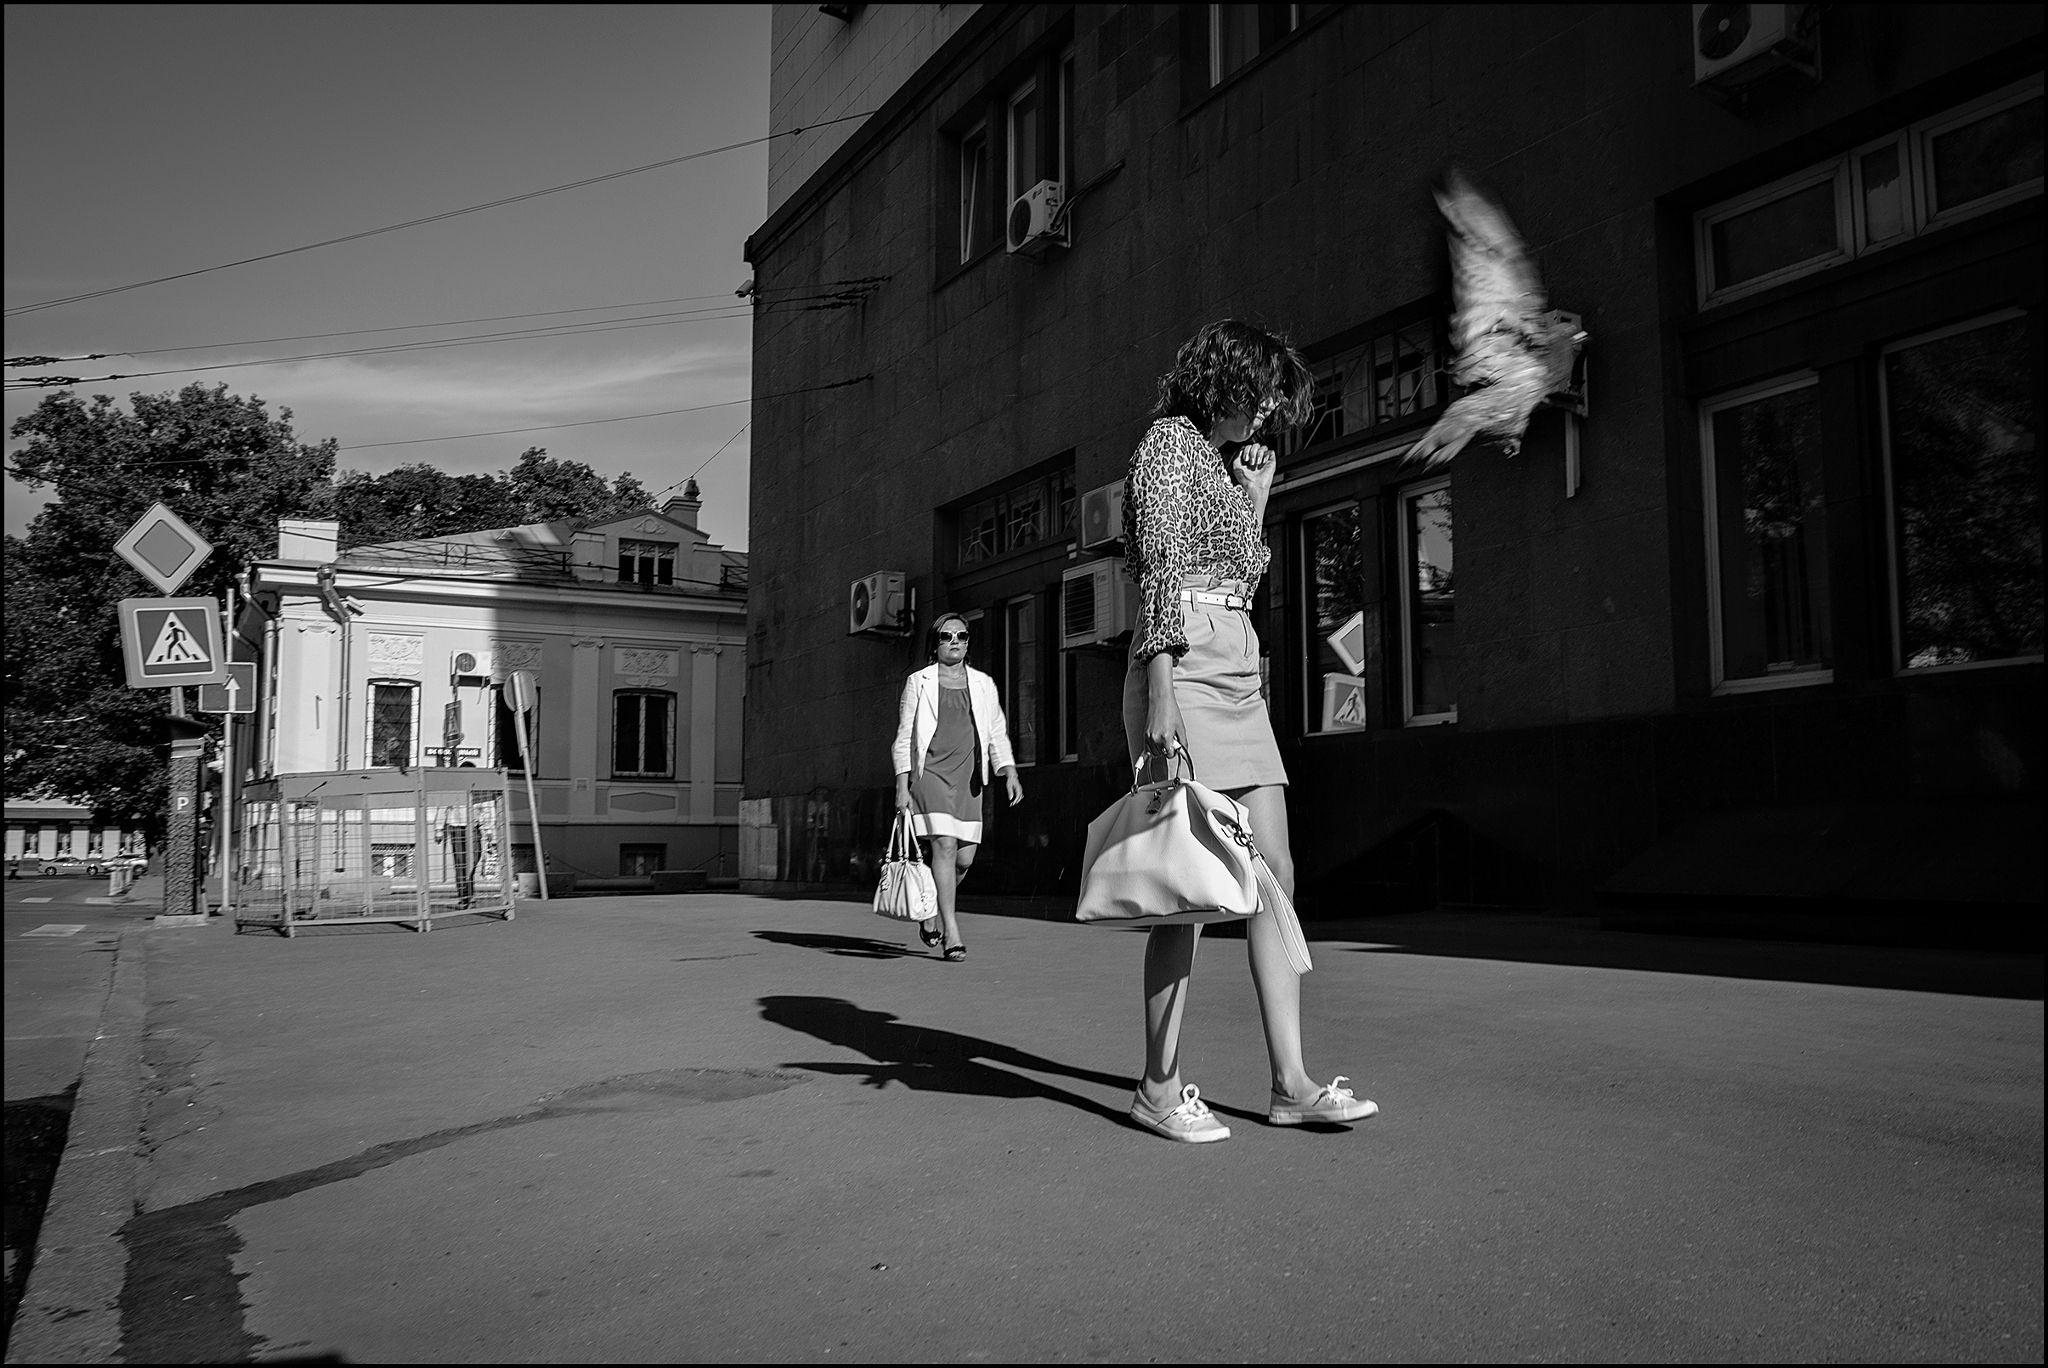 0A7_DSC6658.. by Dmitry Ryzhkov on 500px